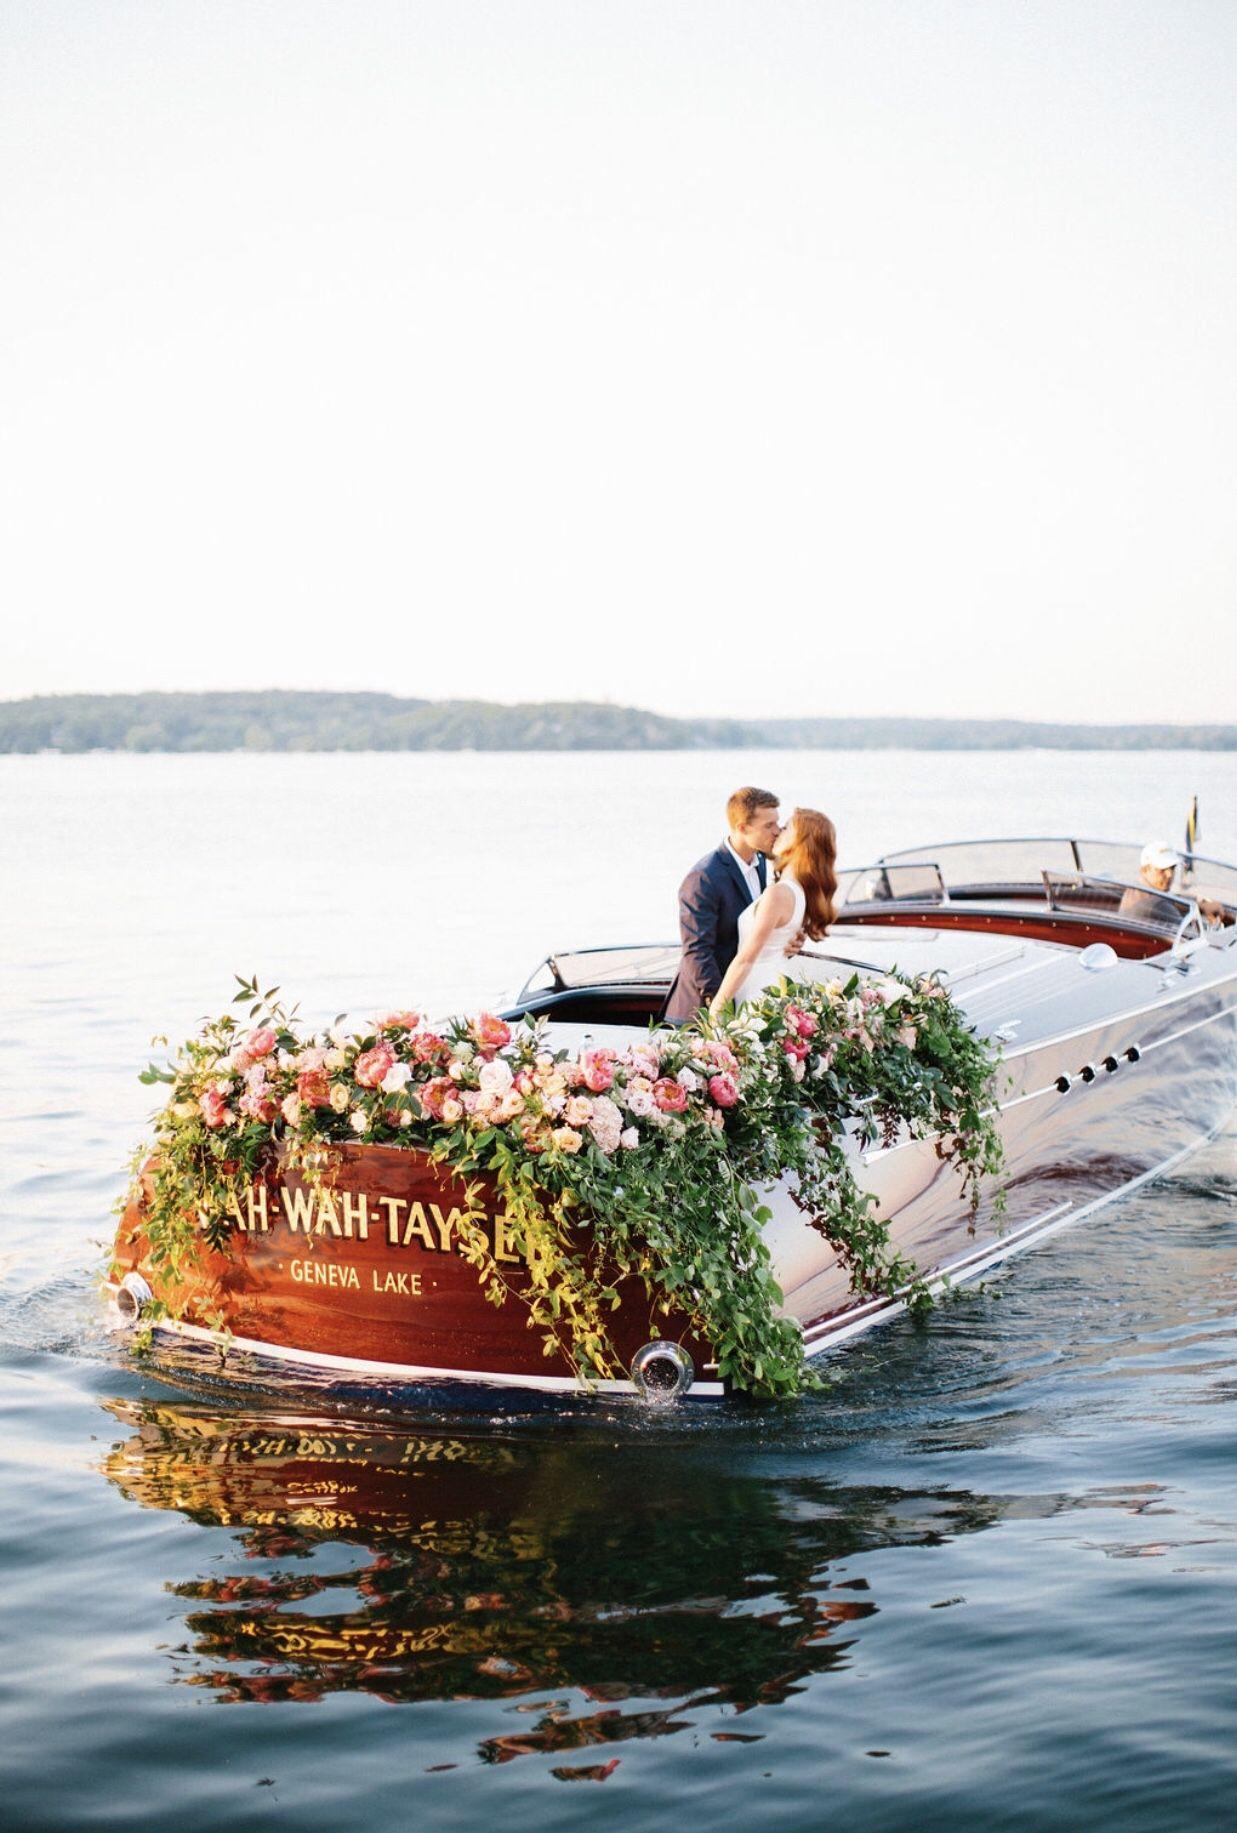 Поздравления на свадьбу лодка